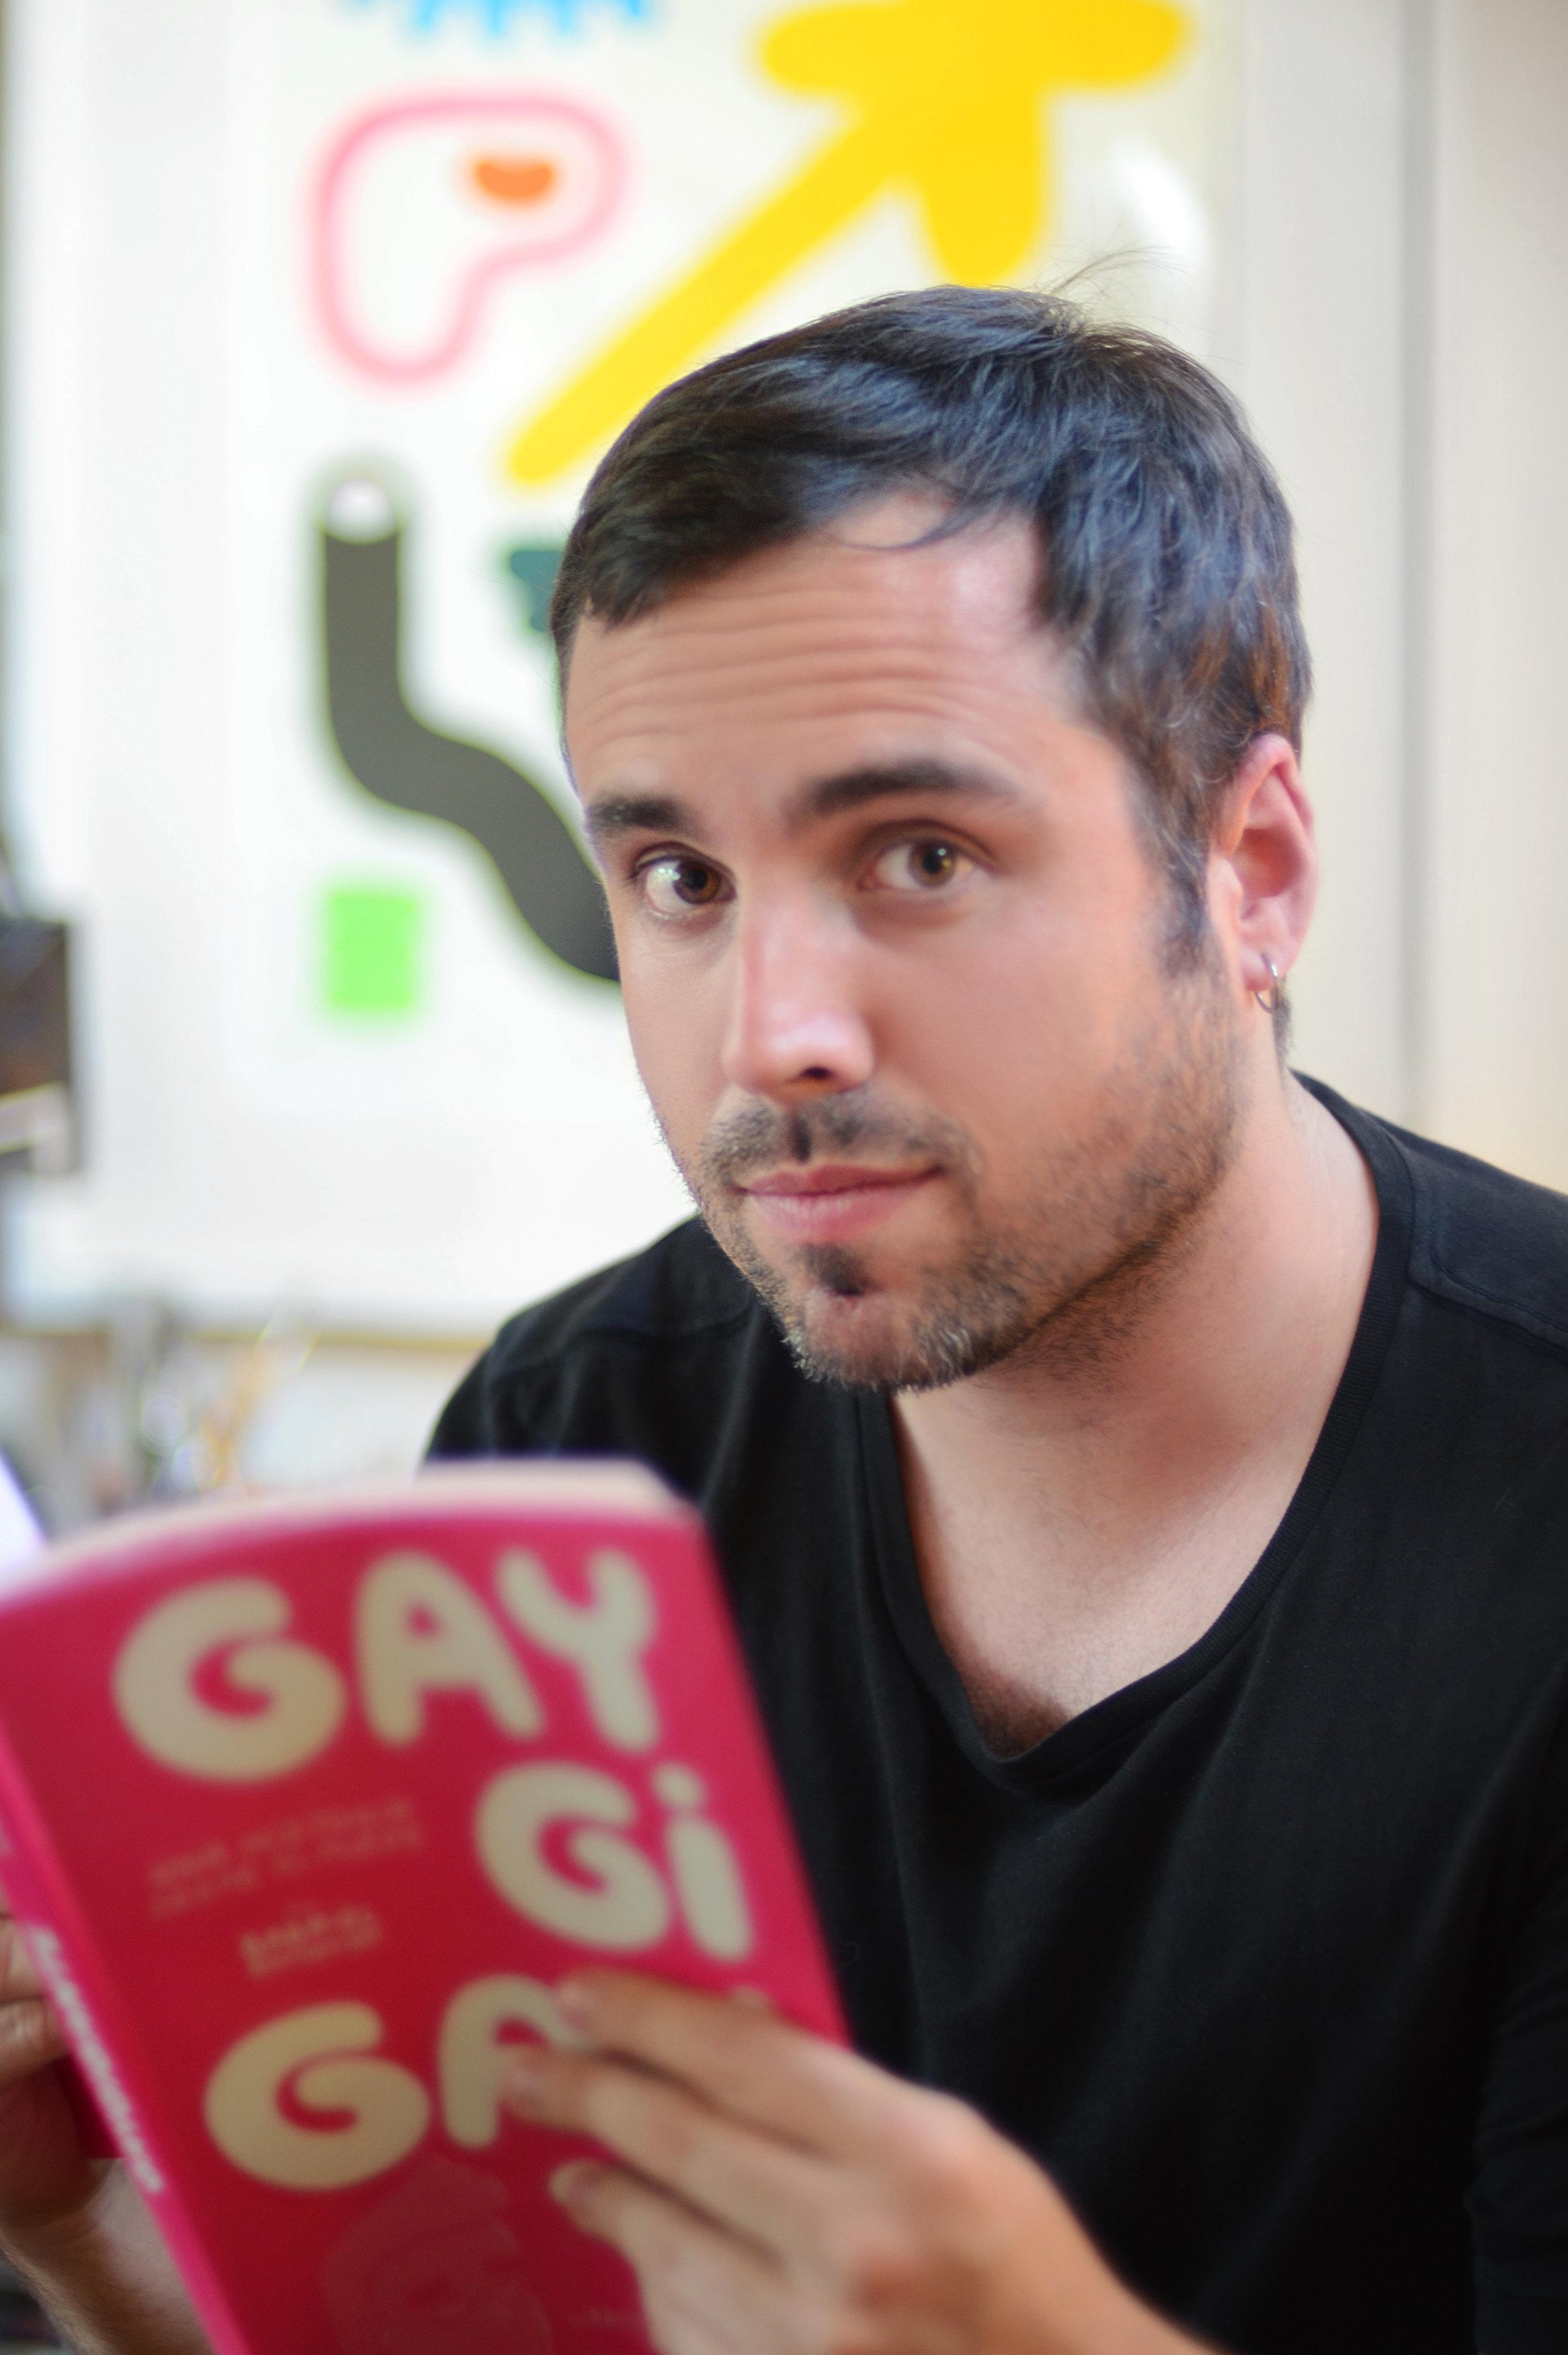 Gabriel Ebensperger Gay Gigante 03.jpg